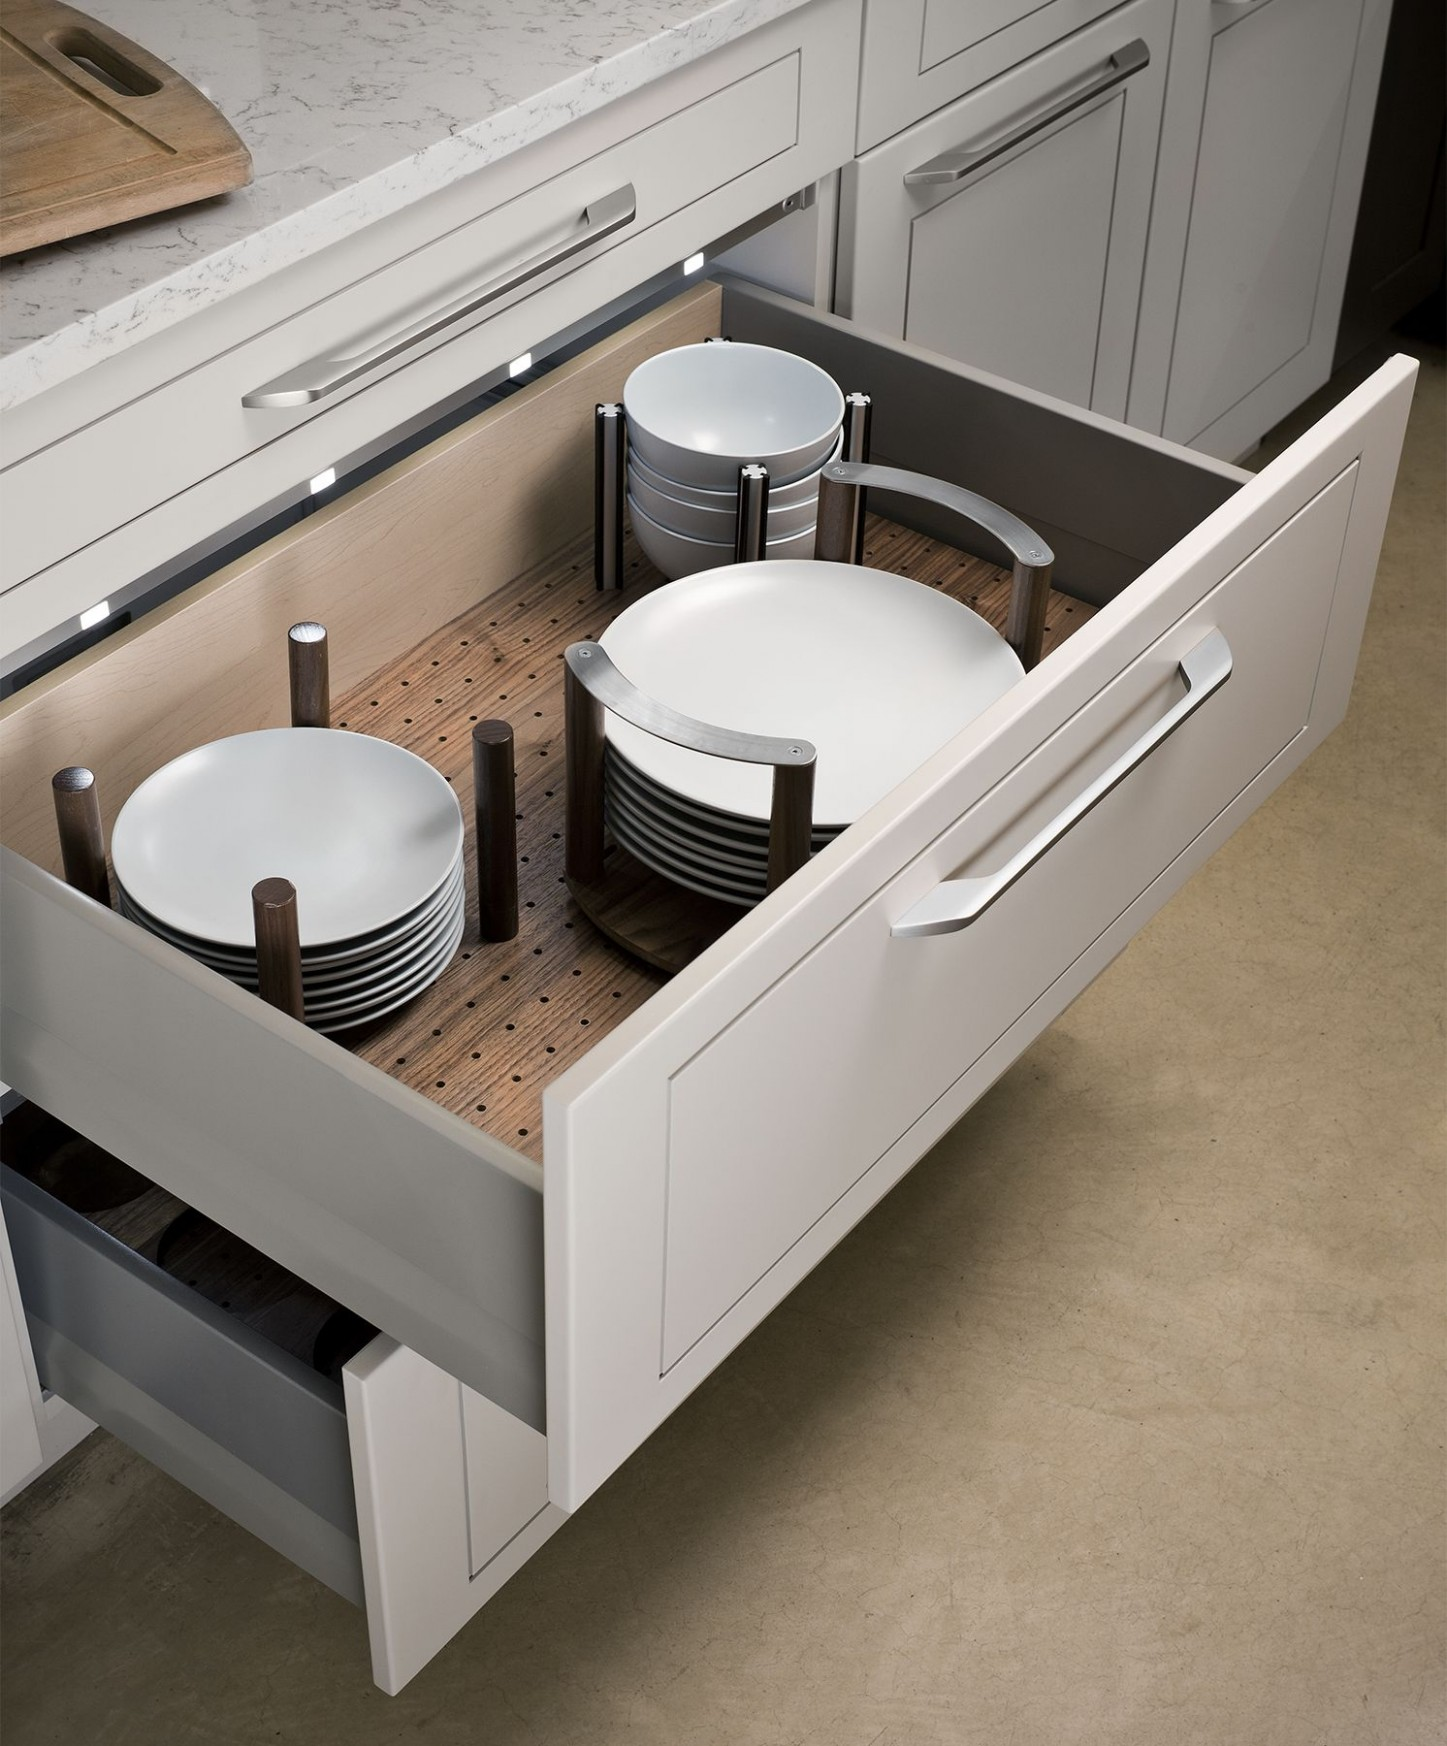 Kitchen Cabinet Accessories  Plain & Fancy  Kitchen cabinet  - Kitchen Cabinet Accessories That Are Popular